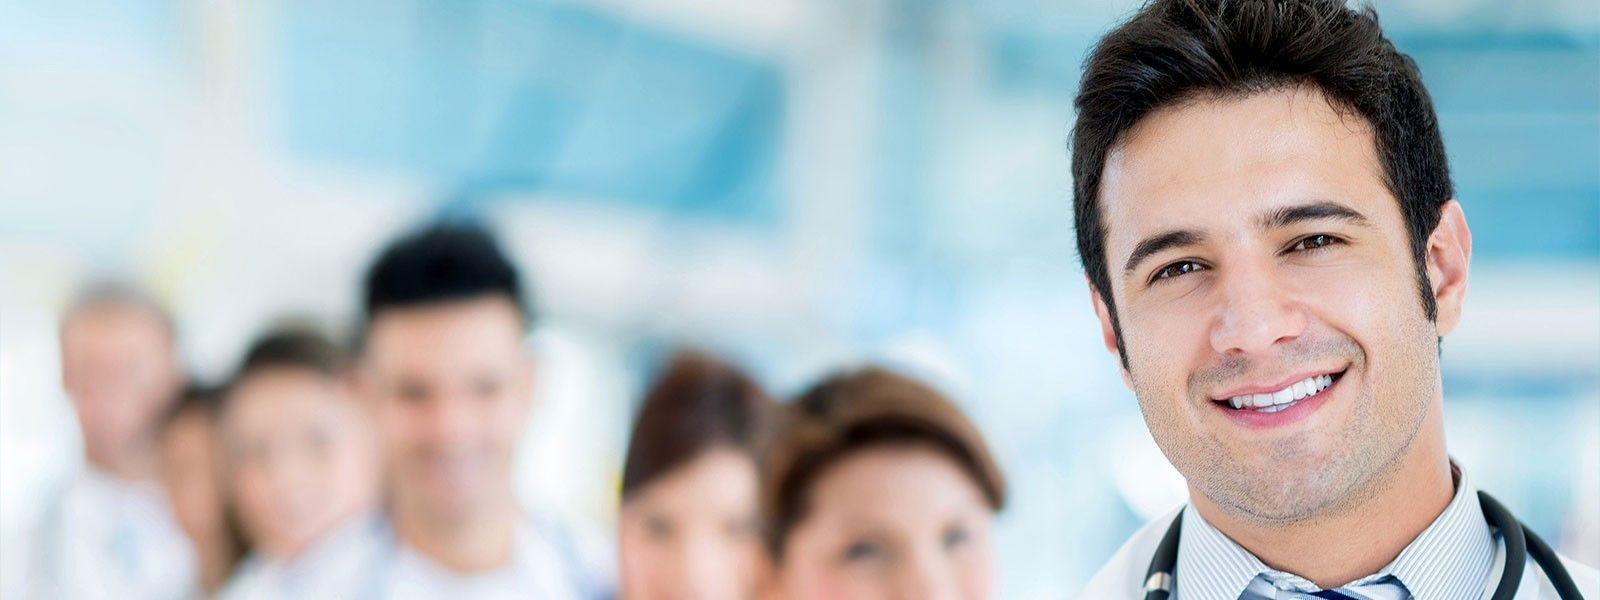 Medical school admission essay service